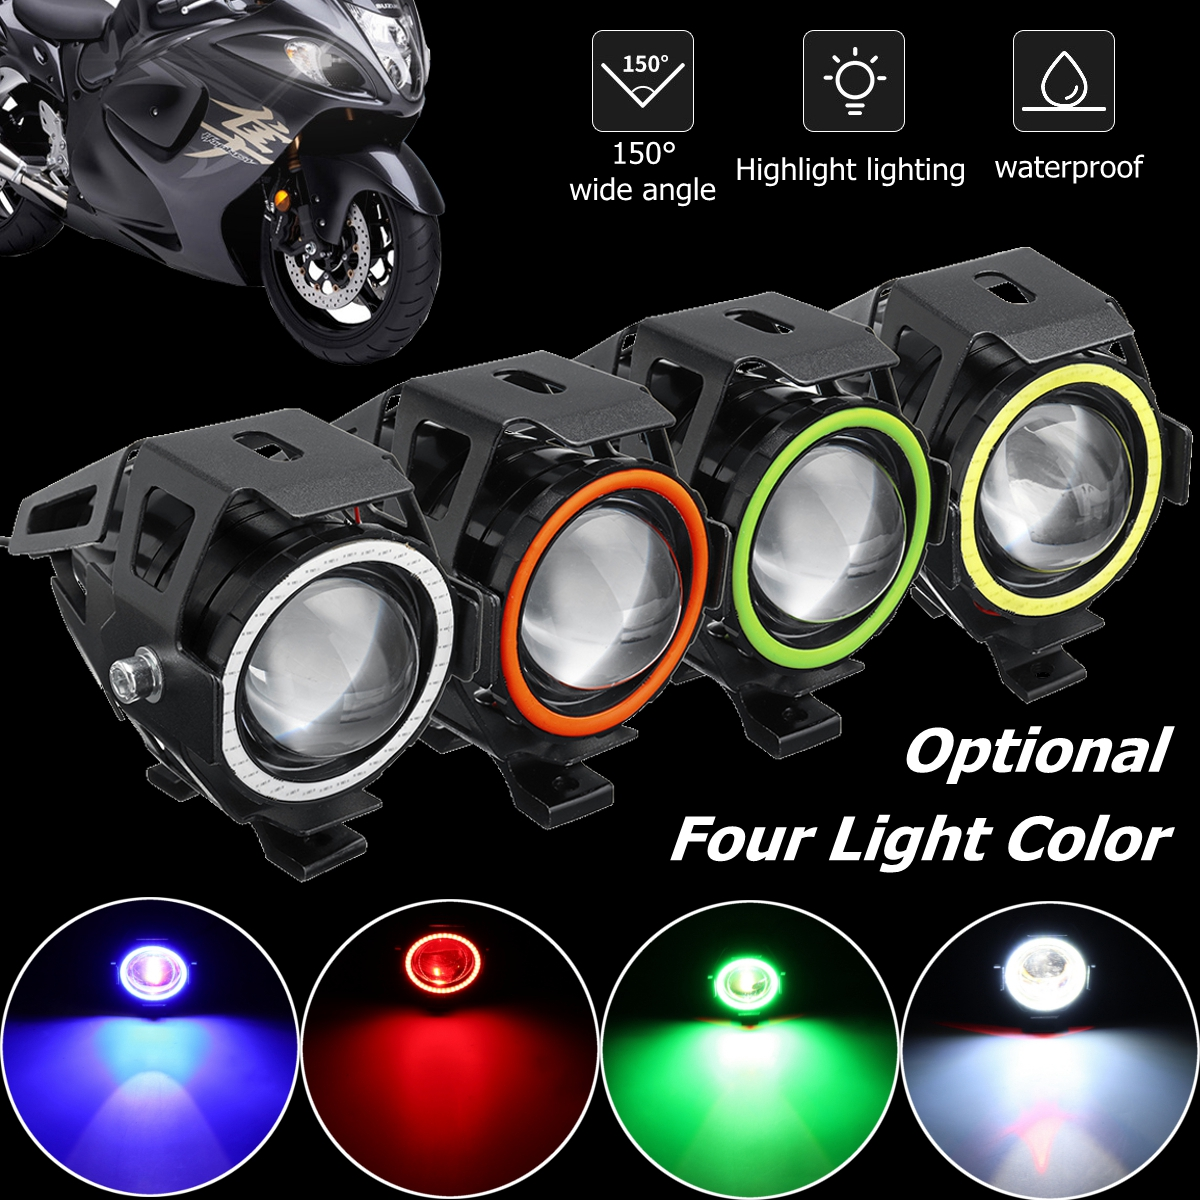 Motorcycle U7 Spot Driving Led Headlight 125w 150 degree wide angle + switch 2800lm Strobe Fog